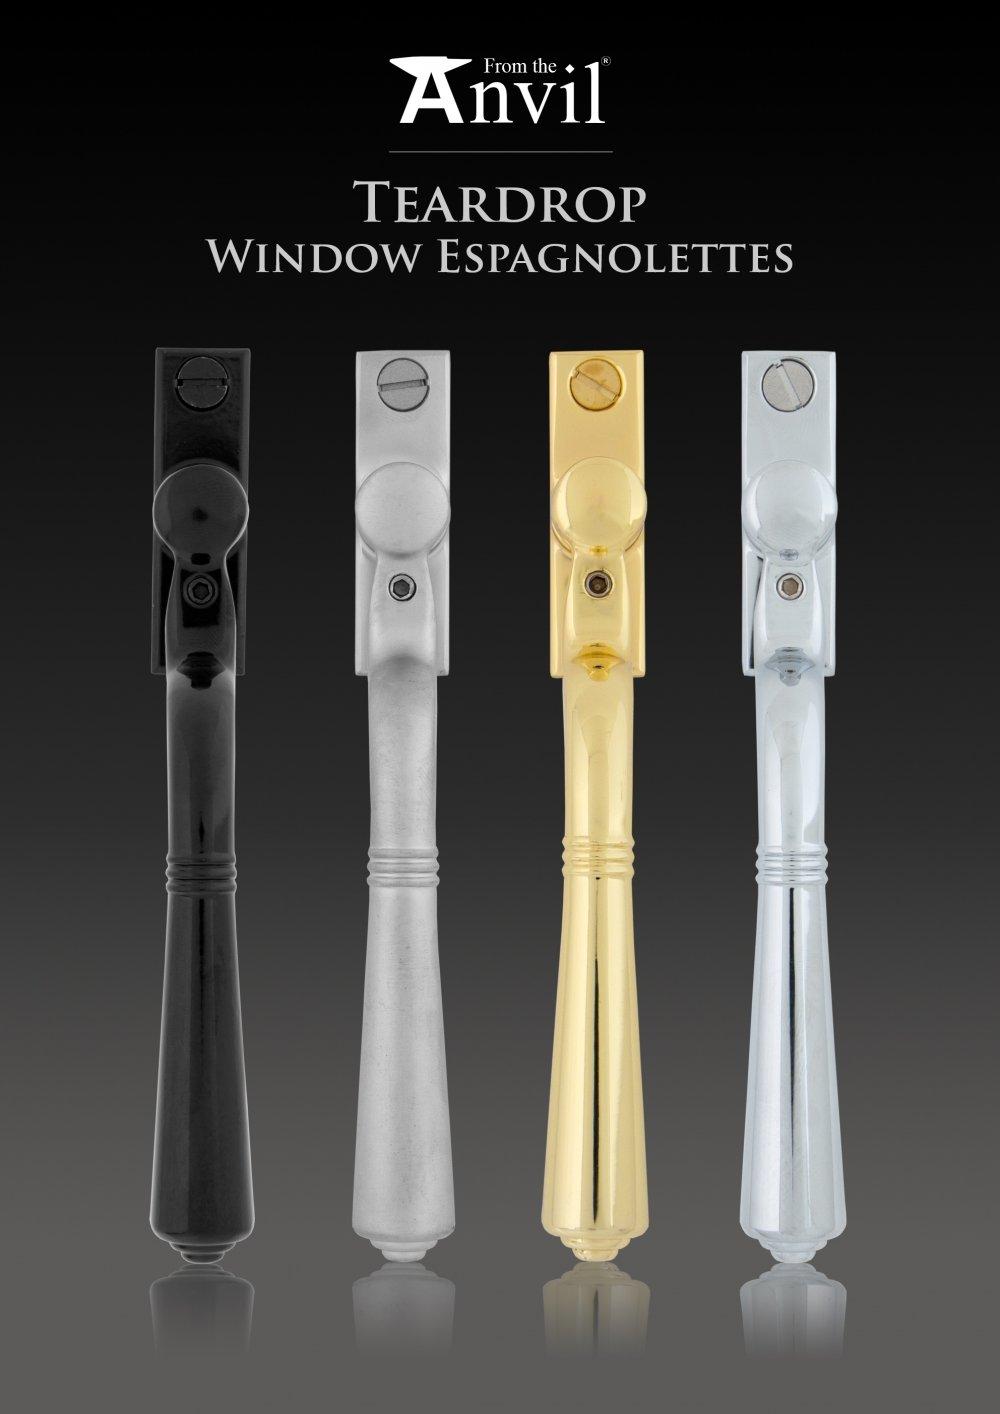 Polished Brass Teardrop Espag. Window Handle image